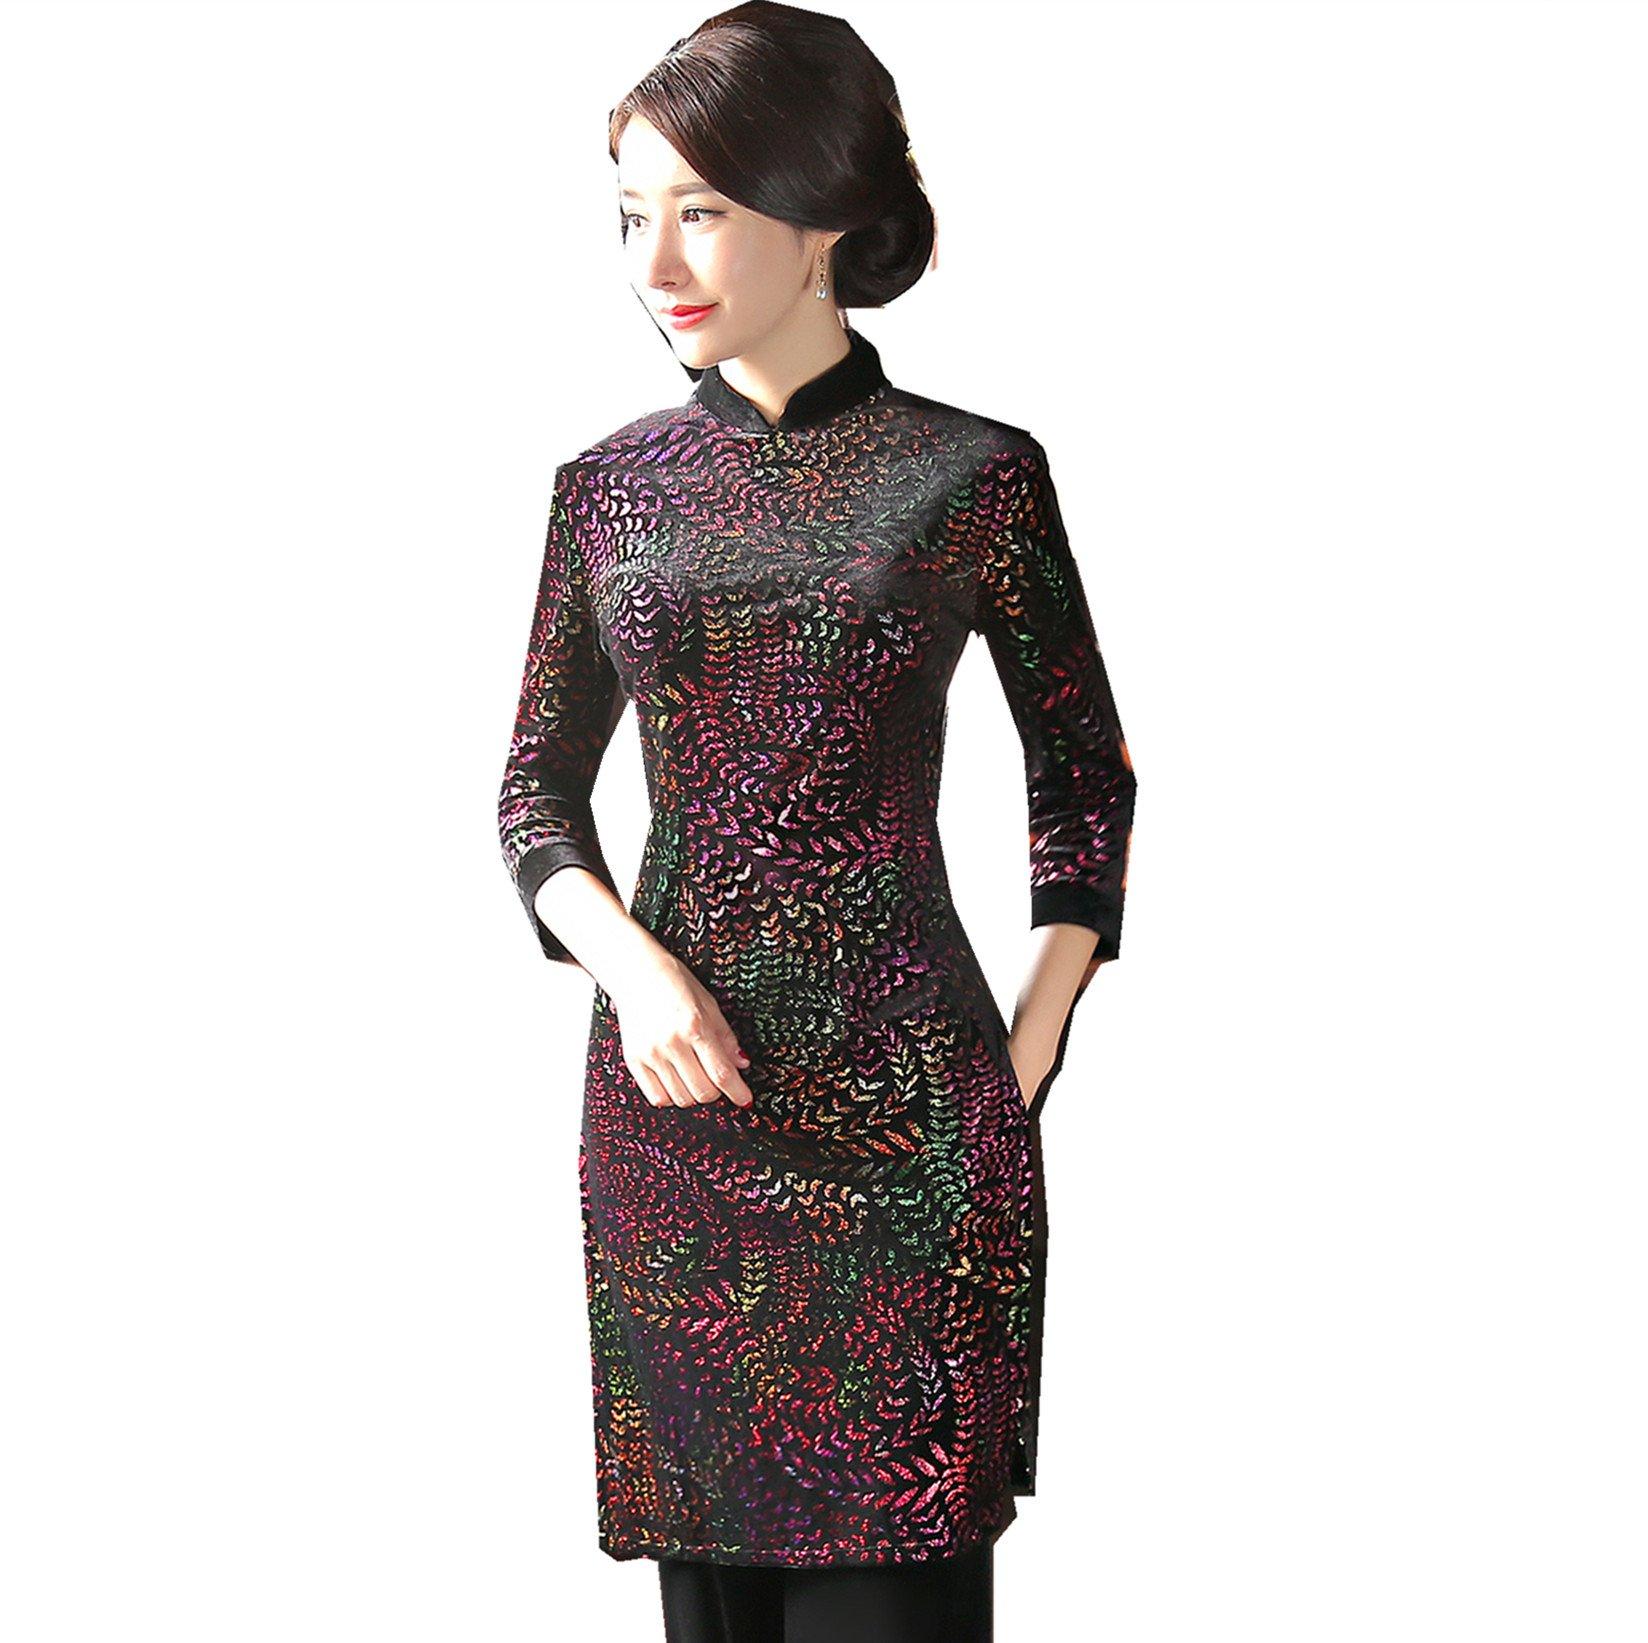 Shanghai Story Half Sleeve Ao Dai Without Pants Cheongsam Qipao Dress 3XL Purple by Shanghai Story